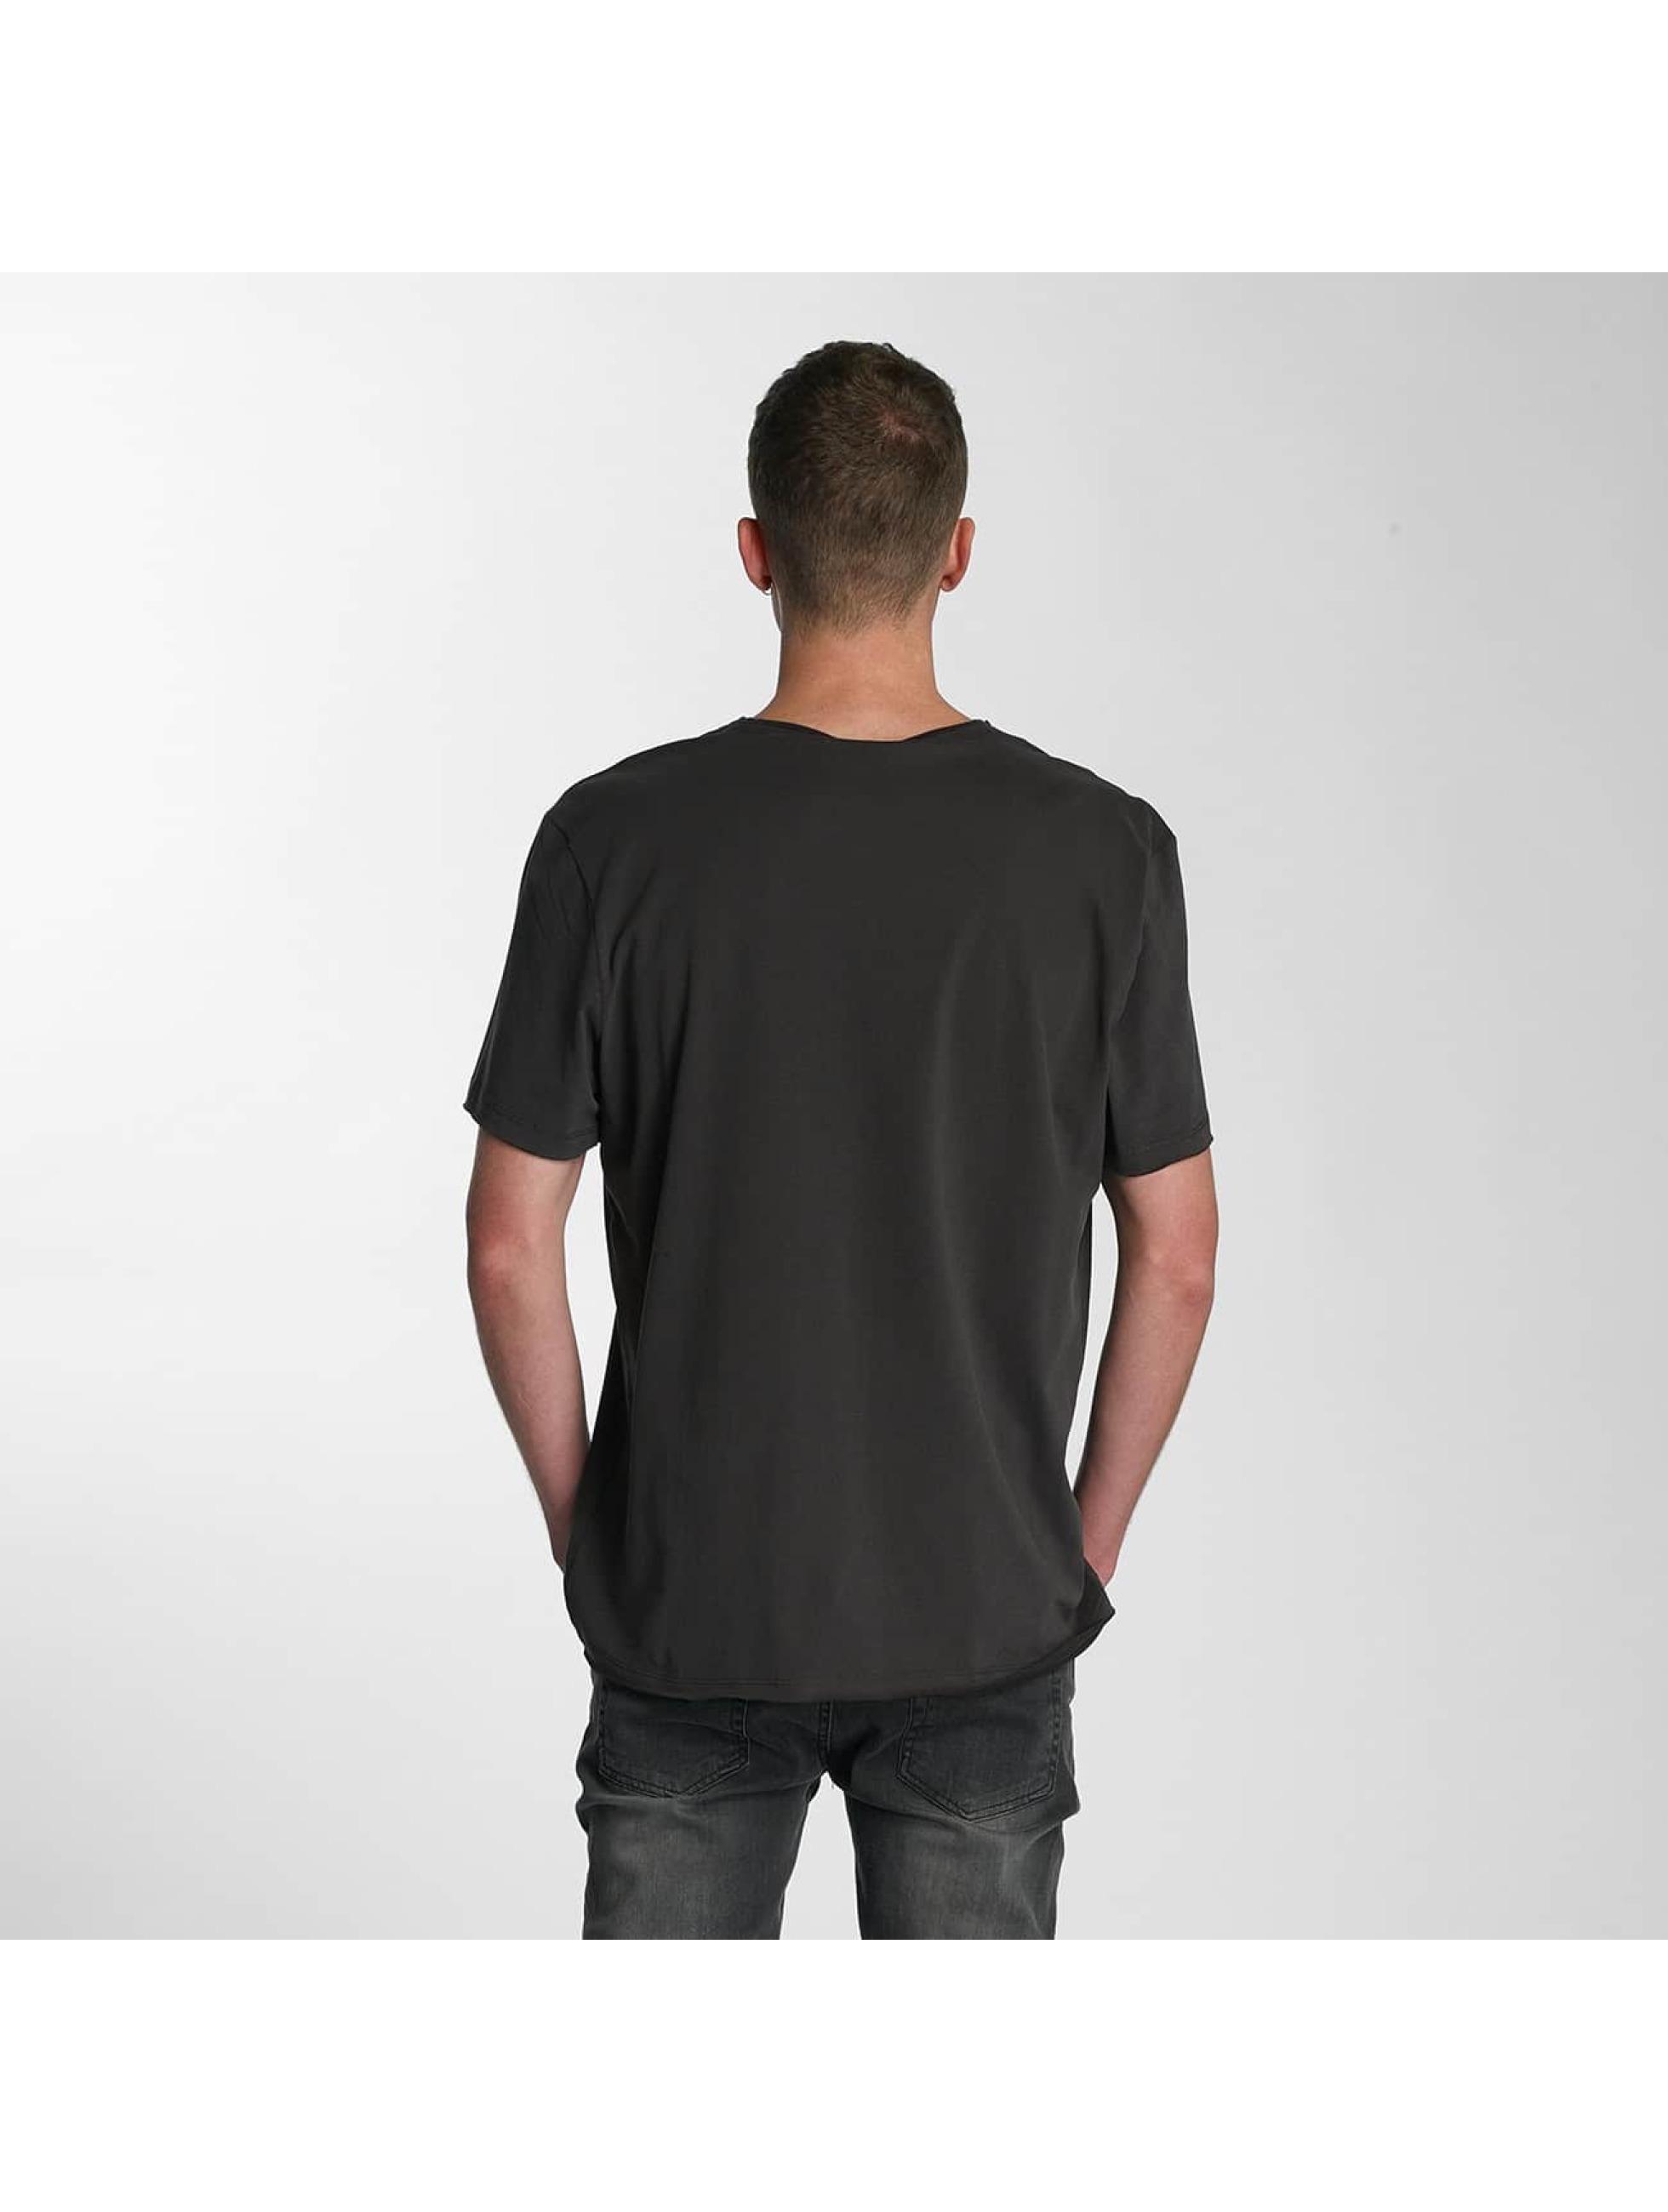 Amplified T-Shirt Guns & Roses LA Paradise City gray